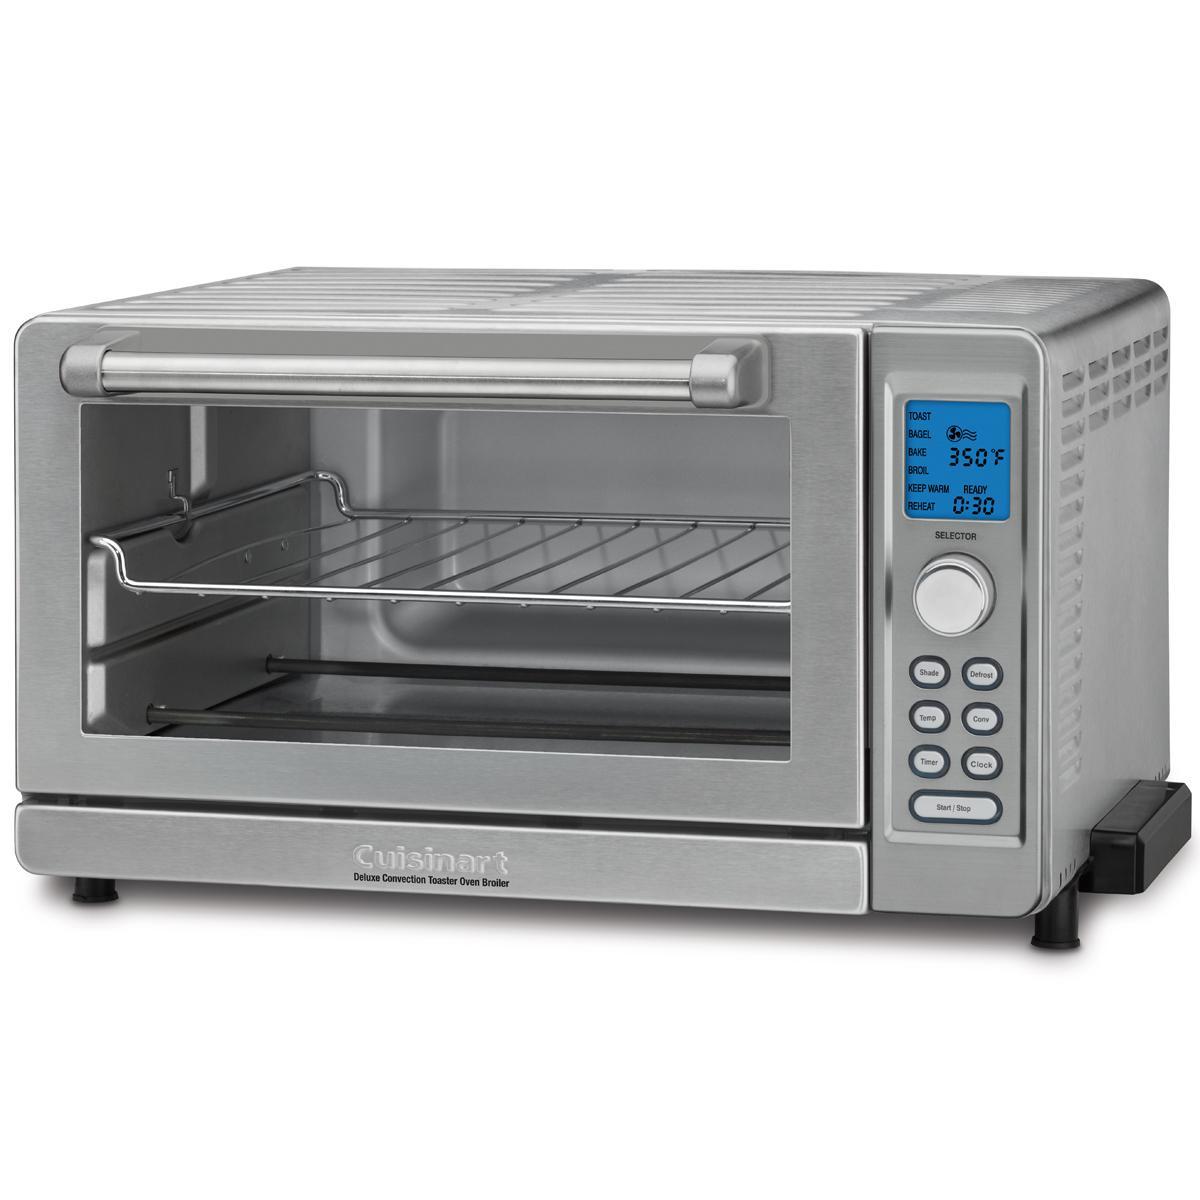 Cuisinart Tob 135c Deluxe Convection Toaster Oven Broiler